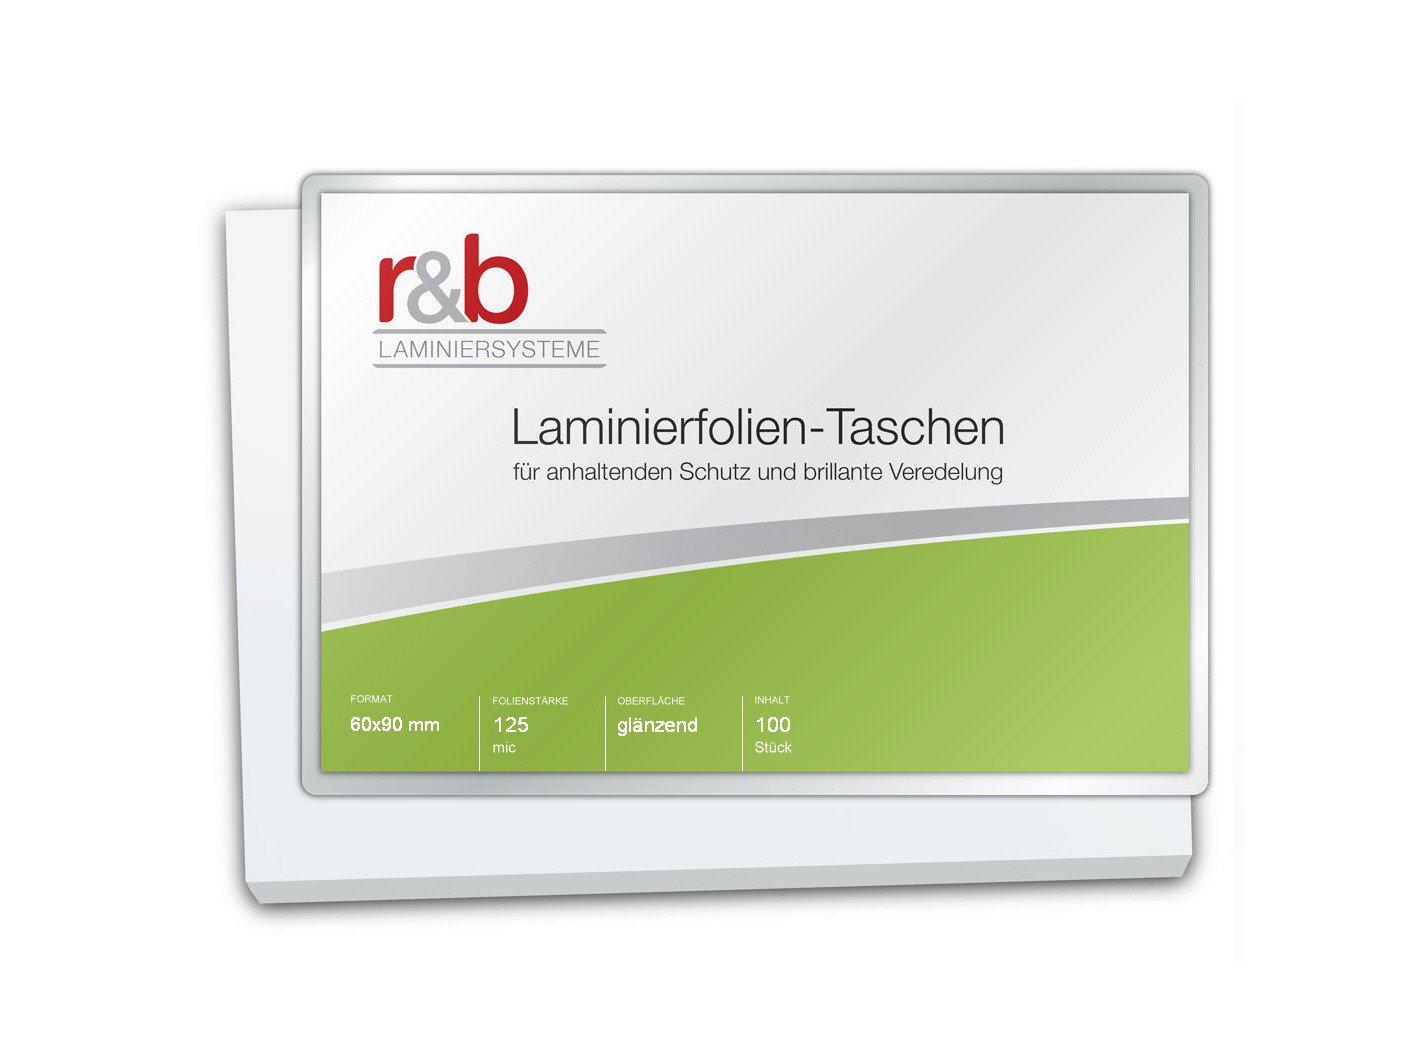 R & B FT BC 125Pouches Business Card, 60X 90mm, 2X 125Mic, 100pezzi, lucido r&b Laminiersysteme FT-BC-125